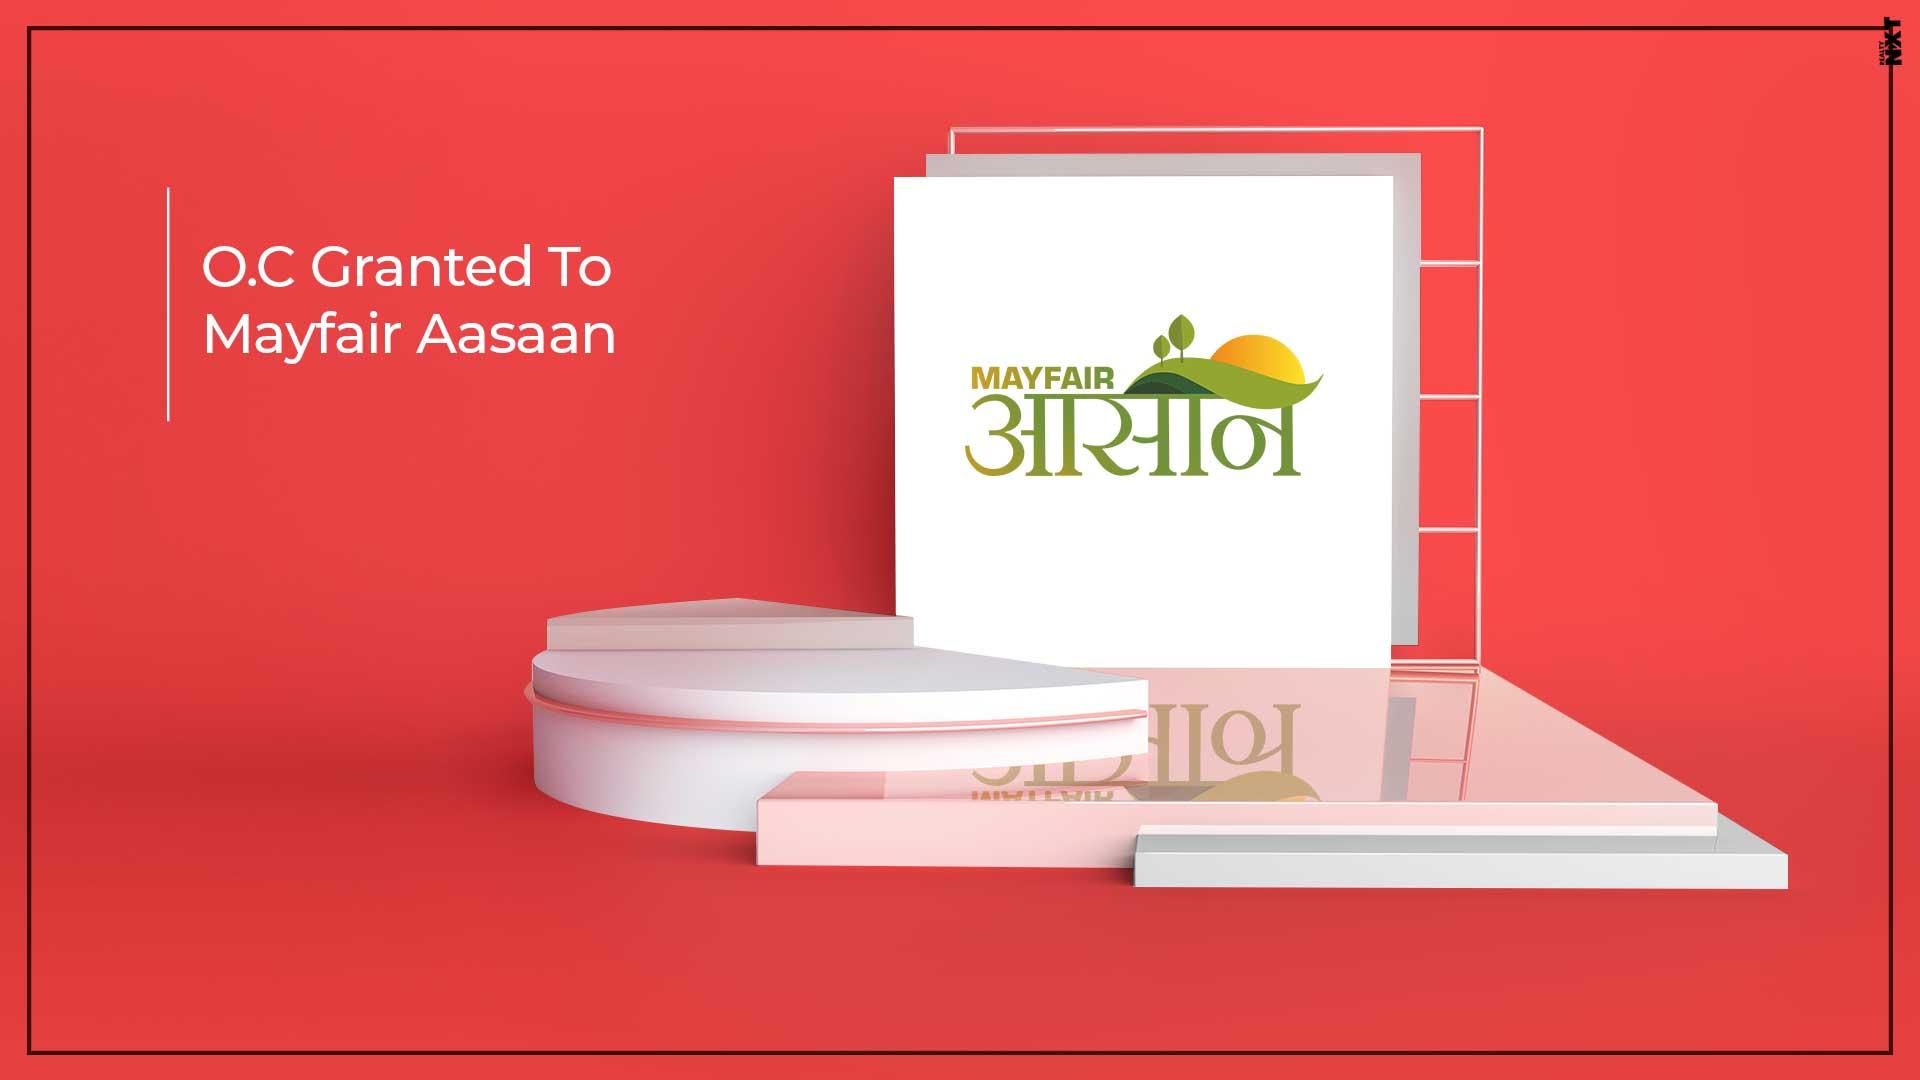 Mayfair Aasaan Received Occupancy Certificate Beforehand